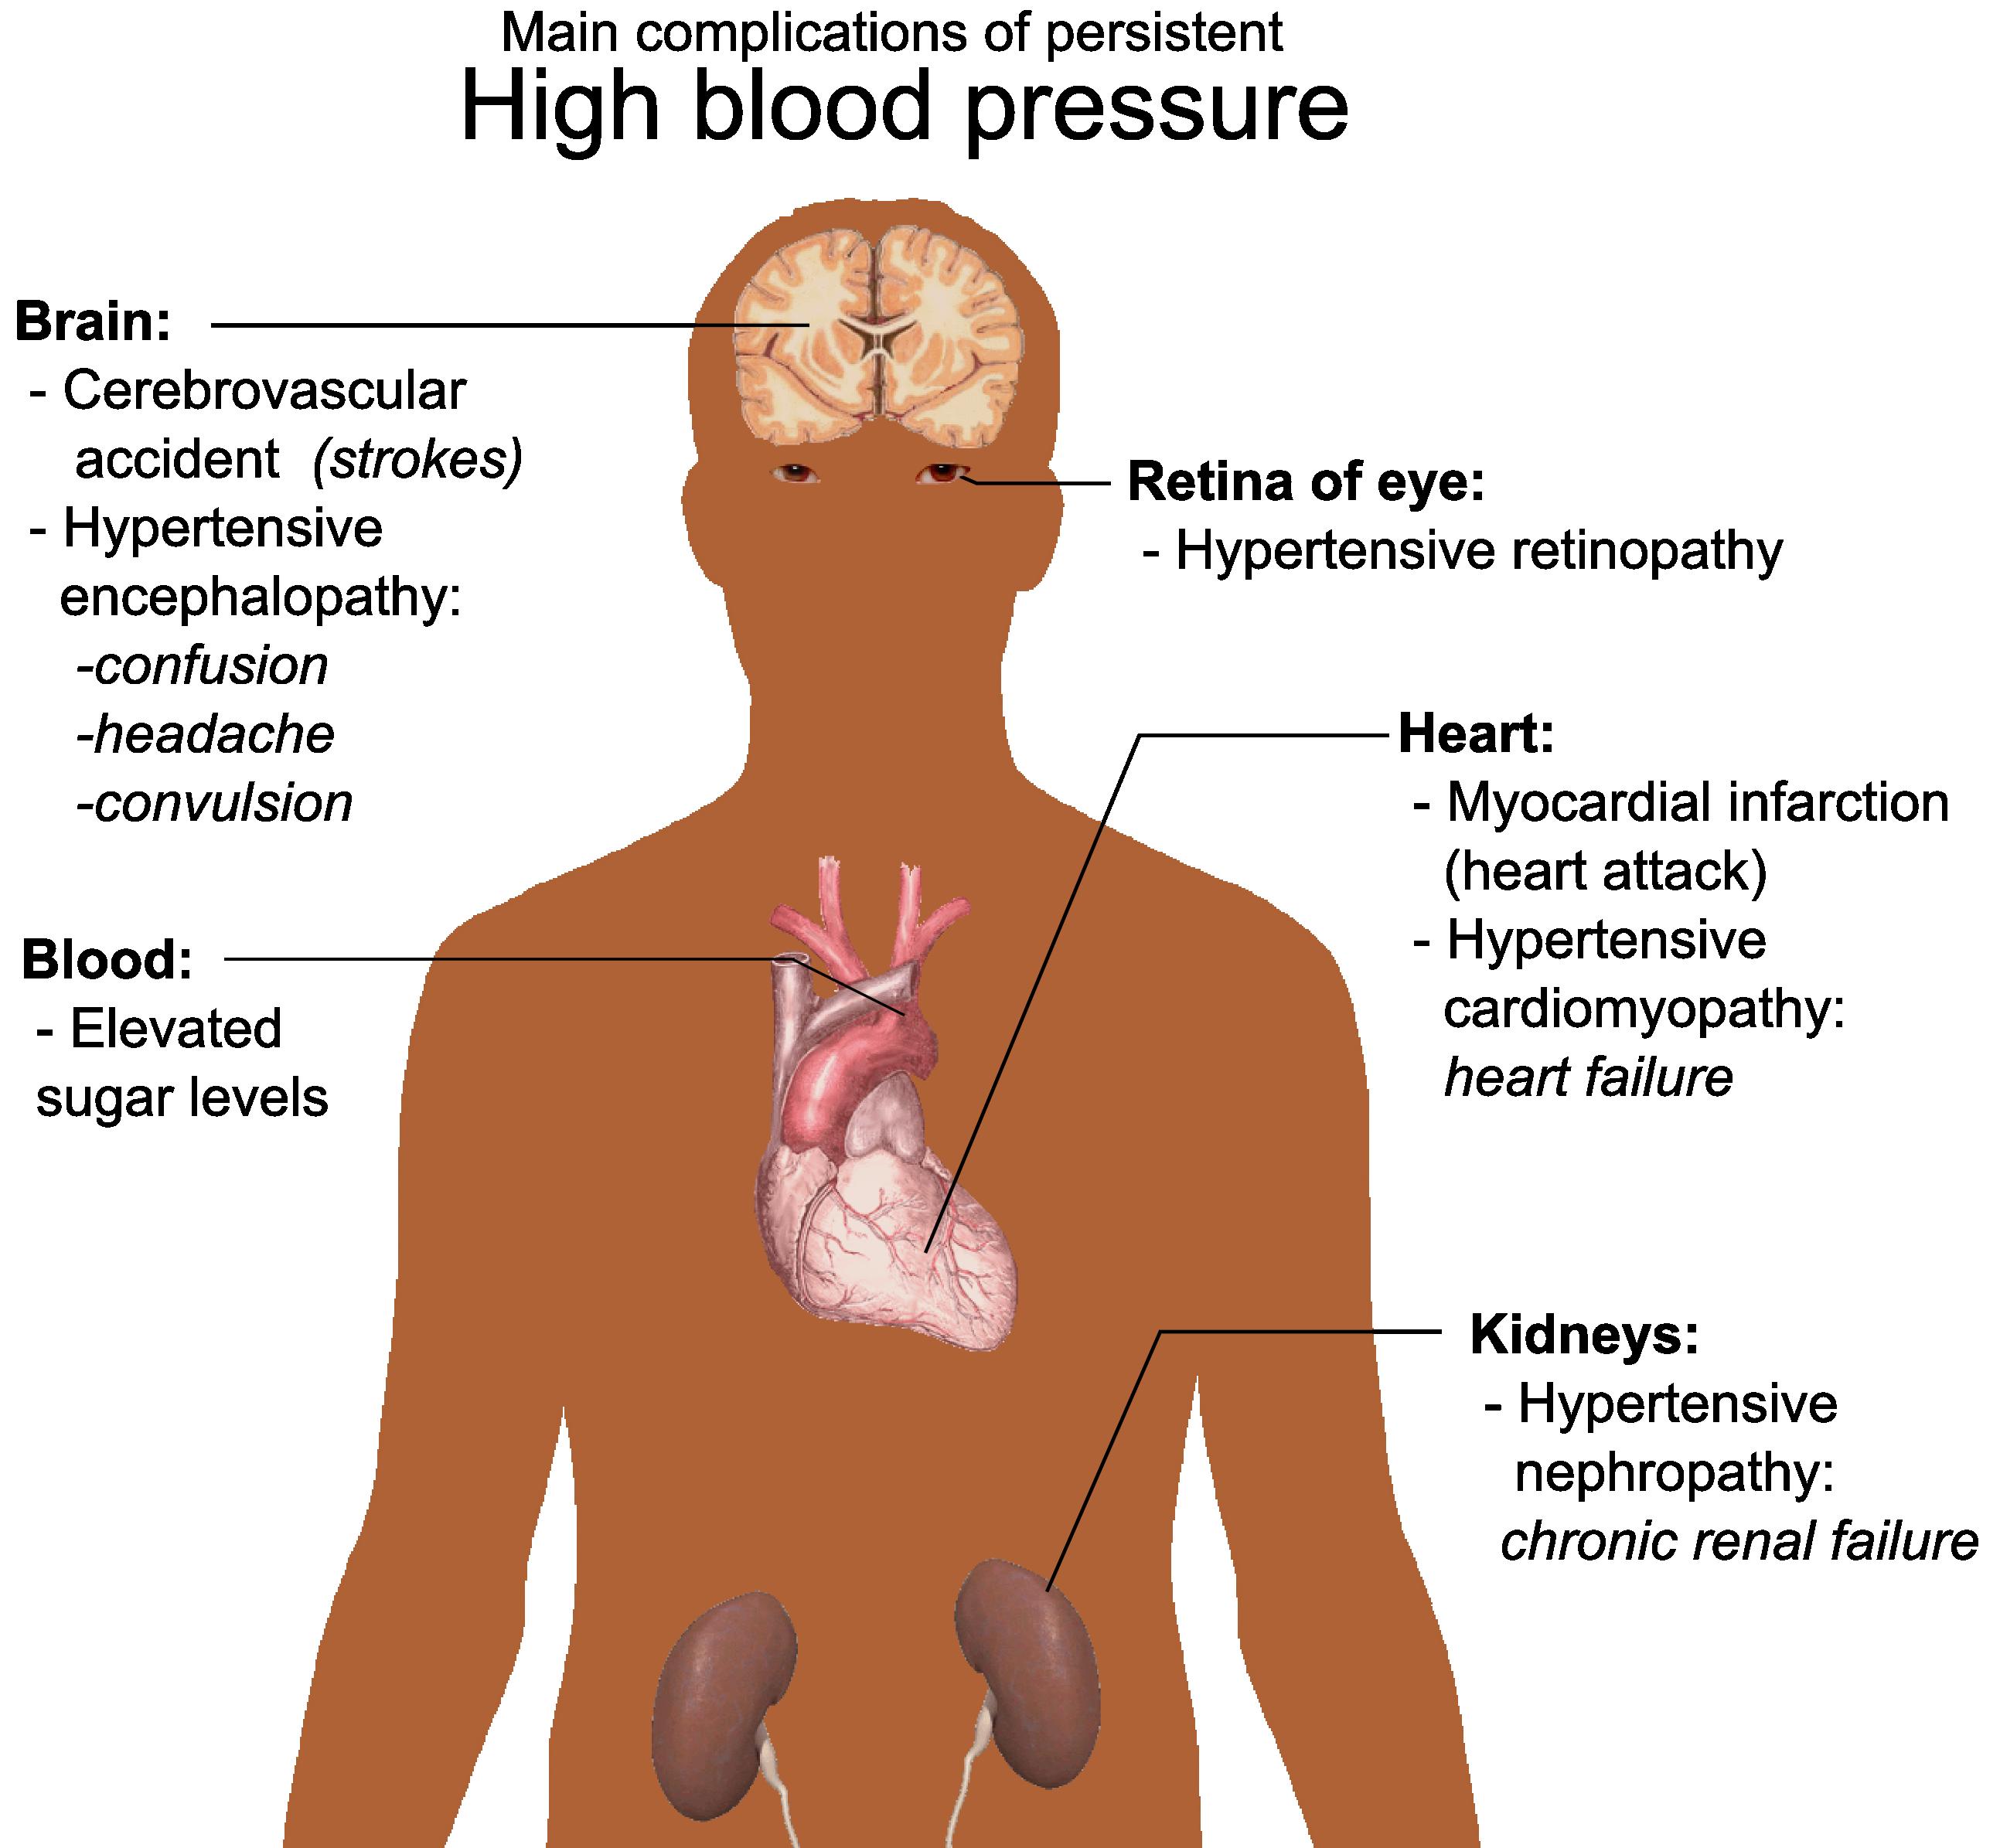 High blood pressure, what should I do